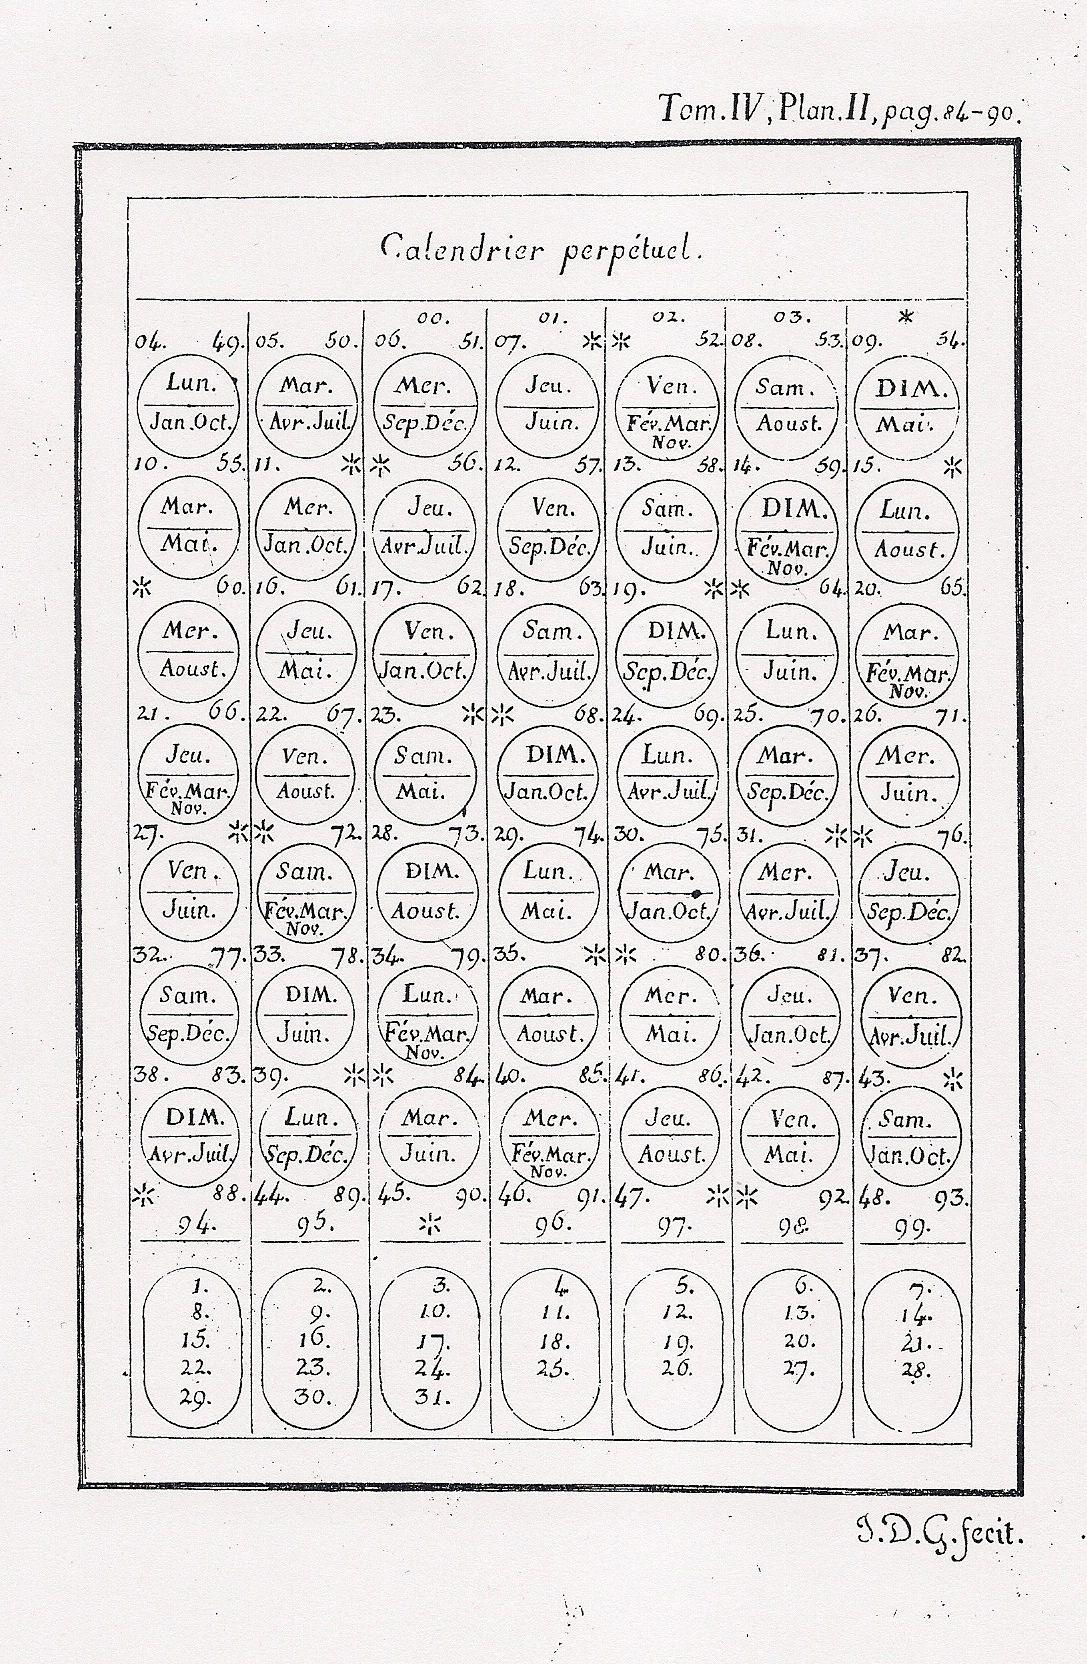 Servois' 1813 Perpetual Calendar, With An English Translation